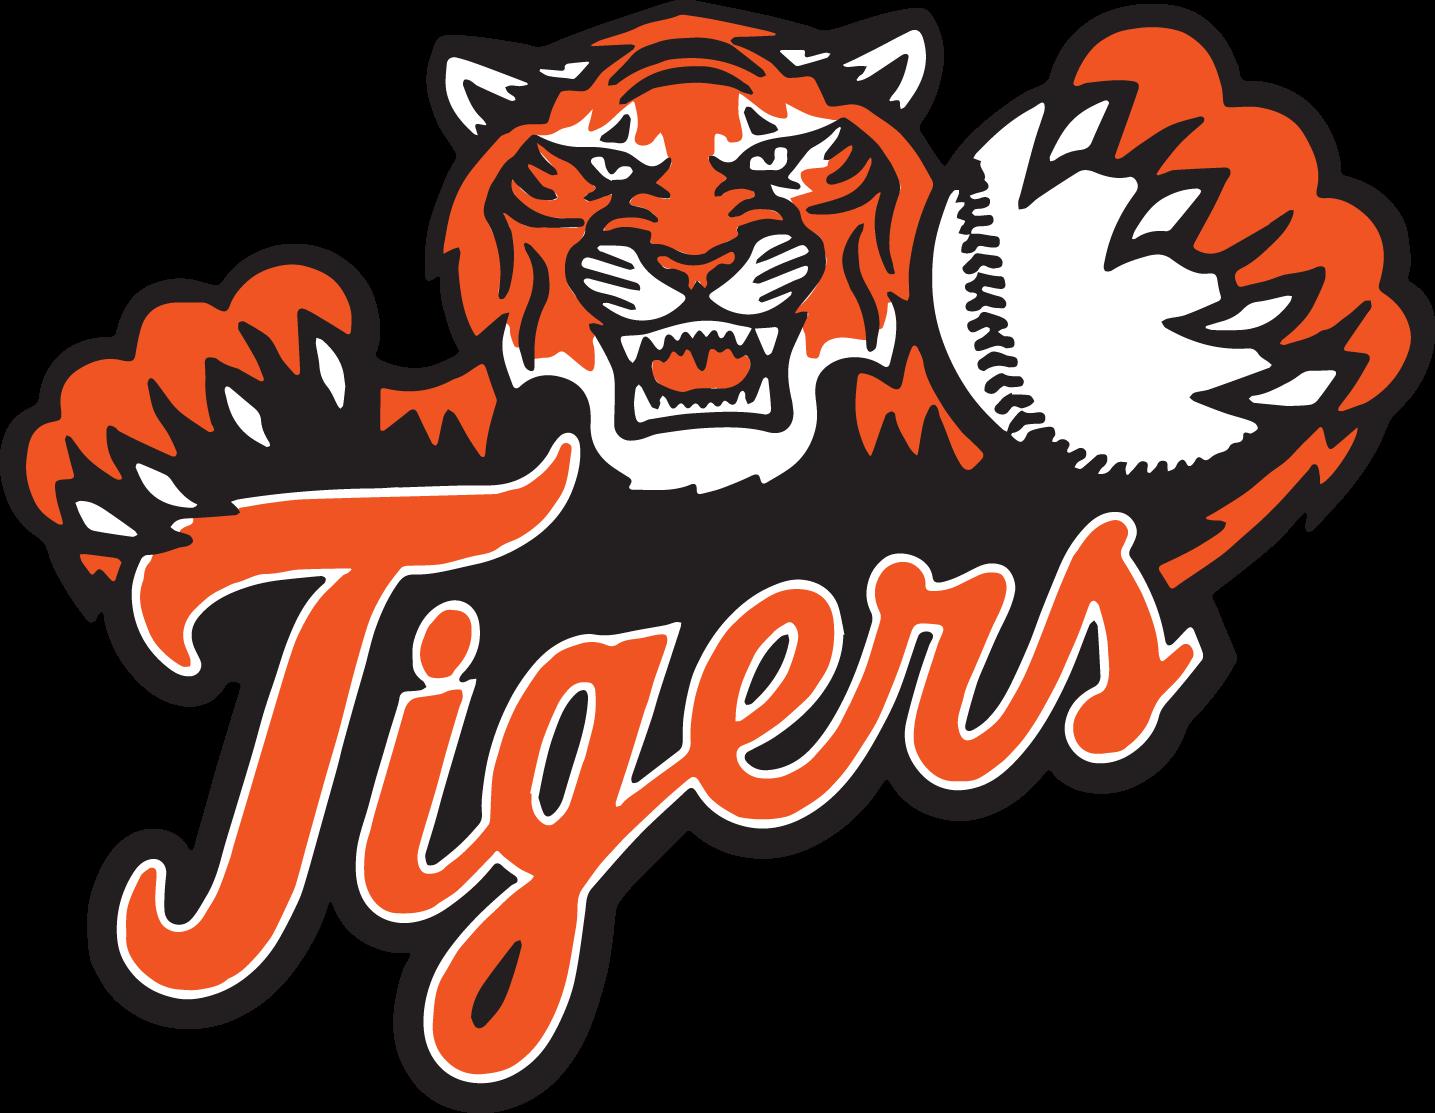 Tiger baseball clipart svg freeuse Tigers baseball clipart svg freeuse